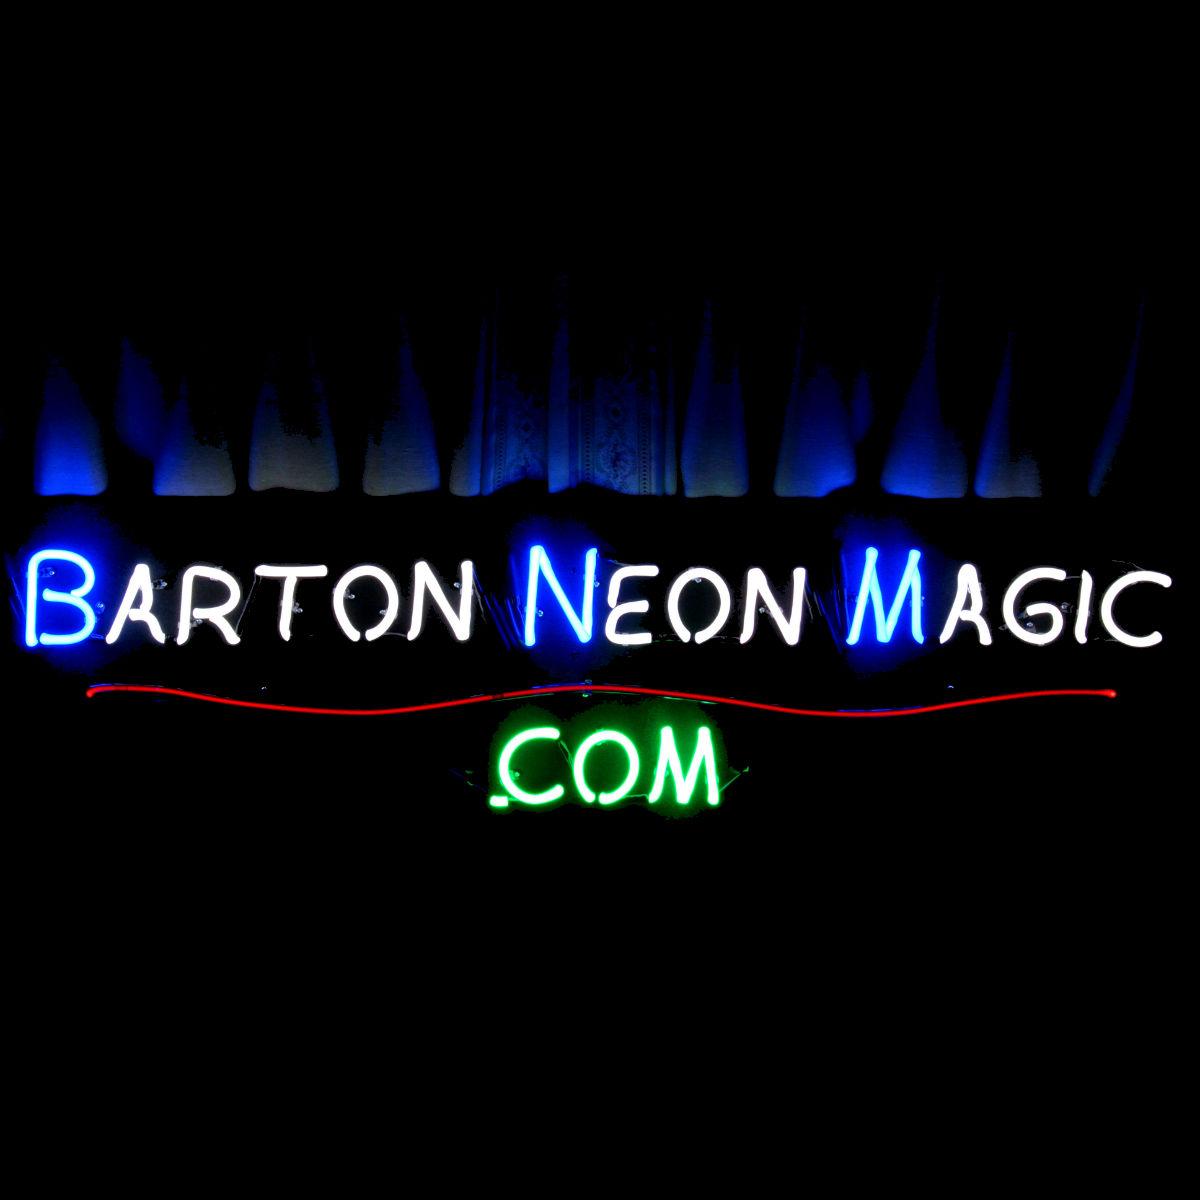 AIRPLANE NEON LIGHT ARTWORKS by John Barton - BartonNeonMagic.com